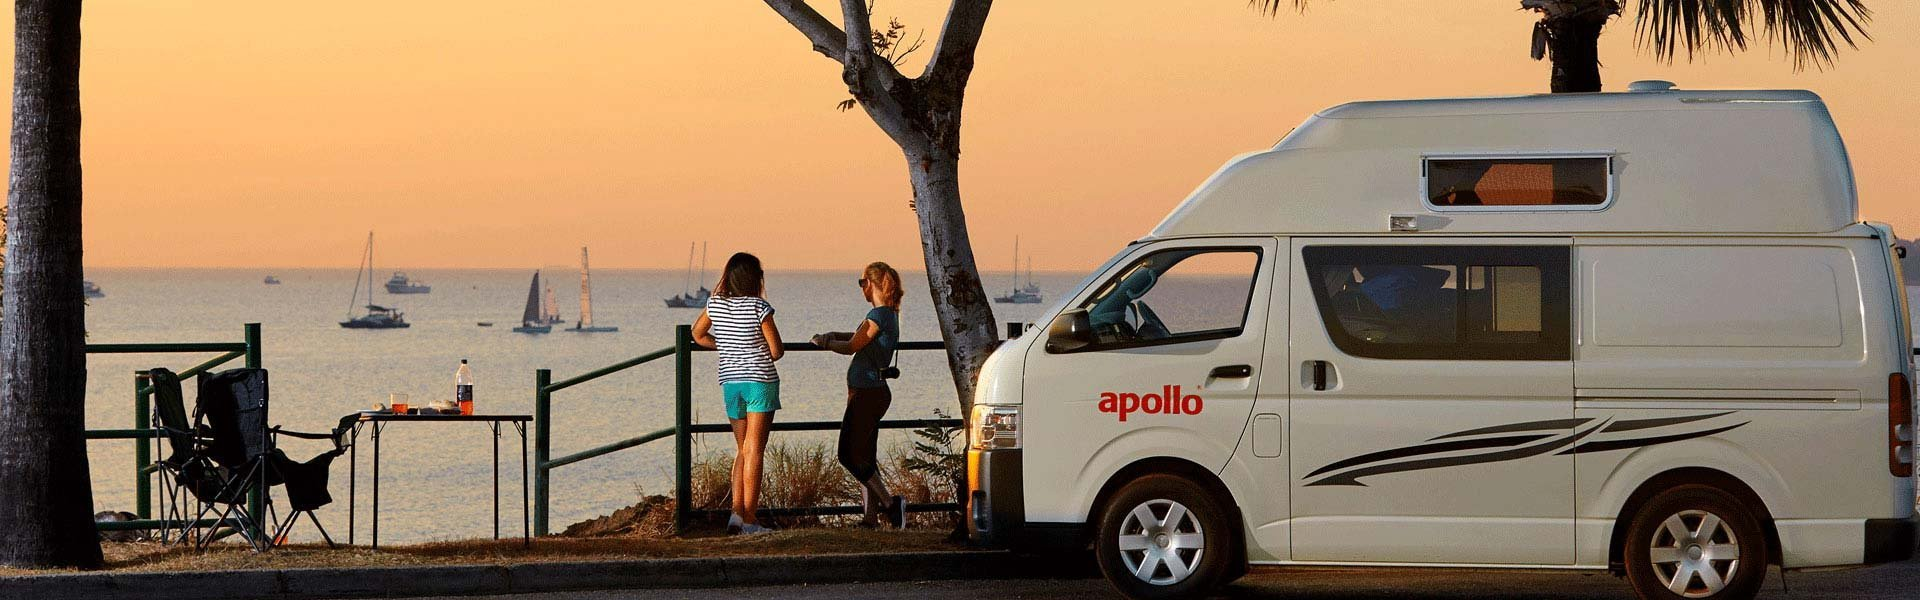 Apollo Australië zonsondergang